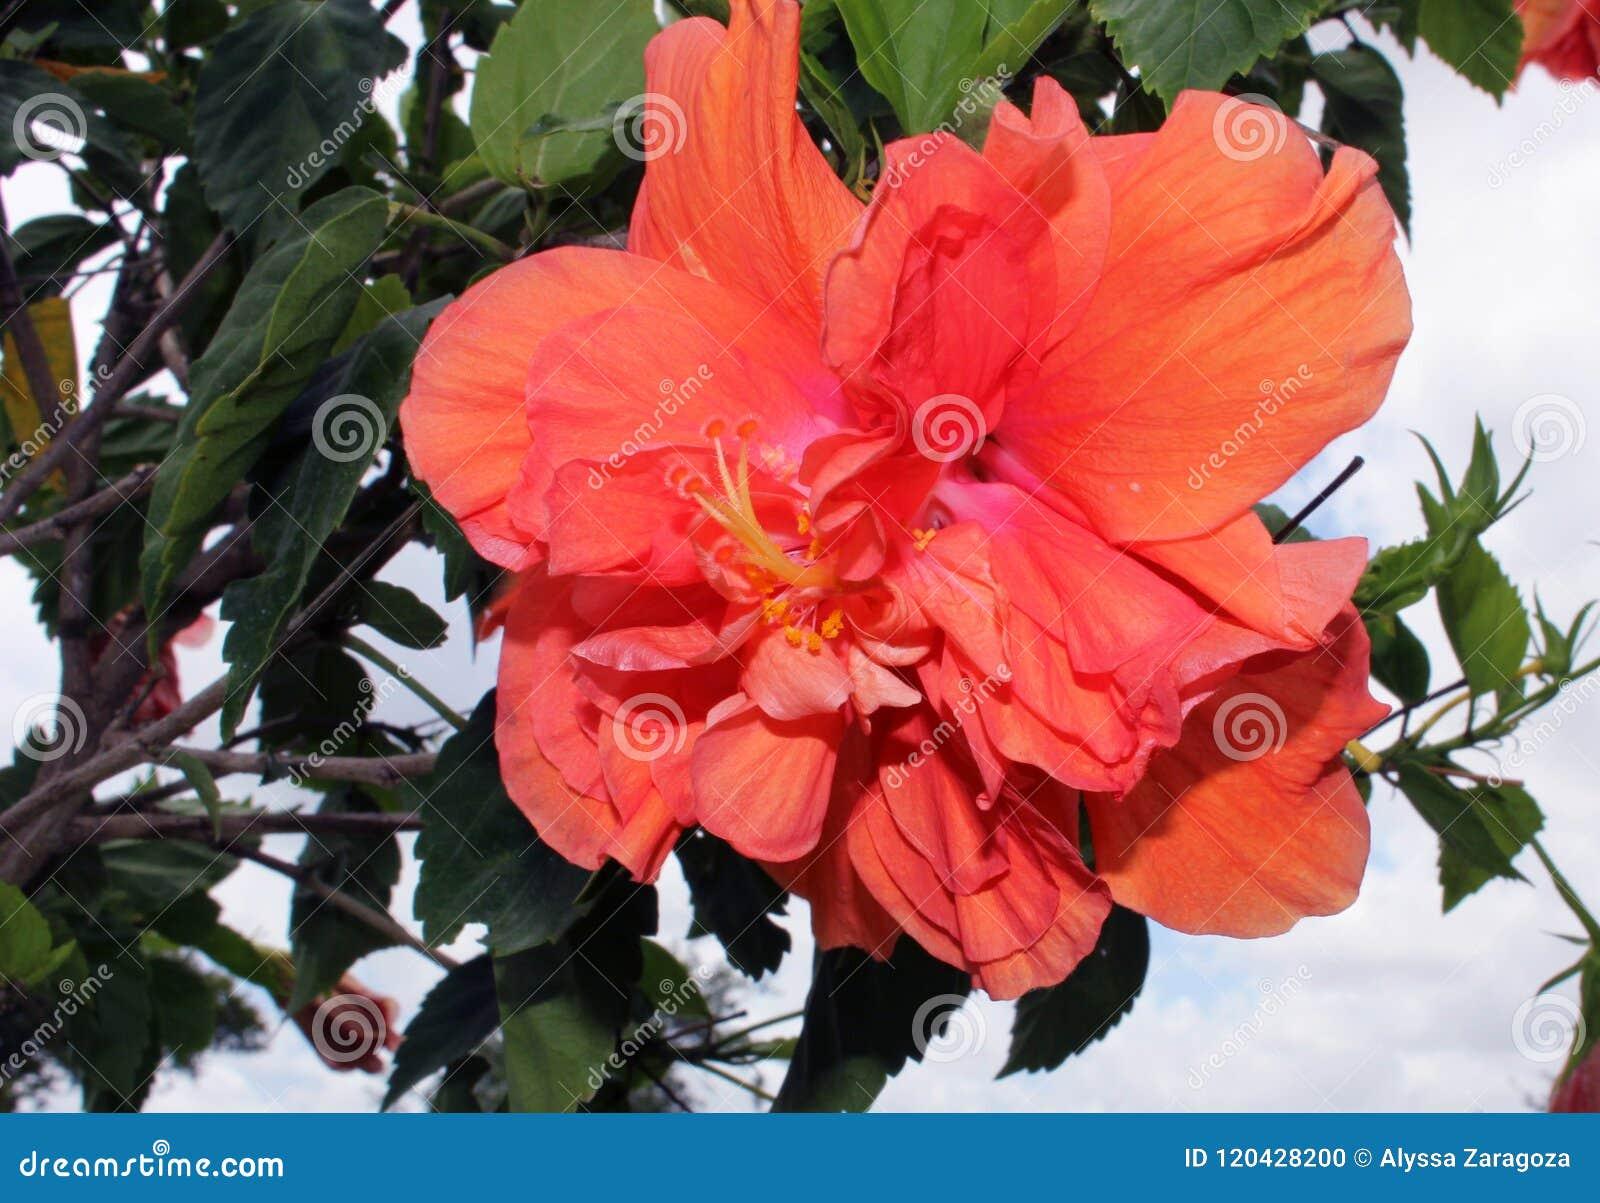 Coral colored hibiscus flower plant stock photo image of foliage coral colored hibiscus flower plant izmirmasajfo